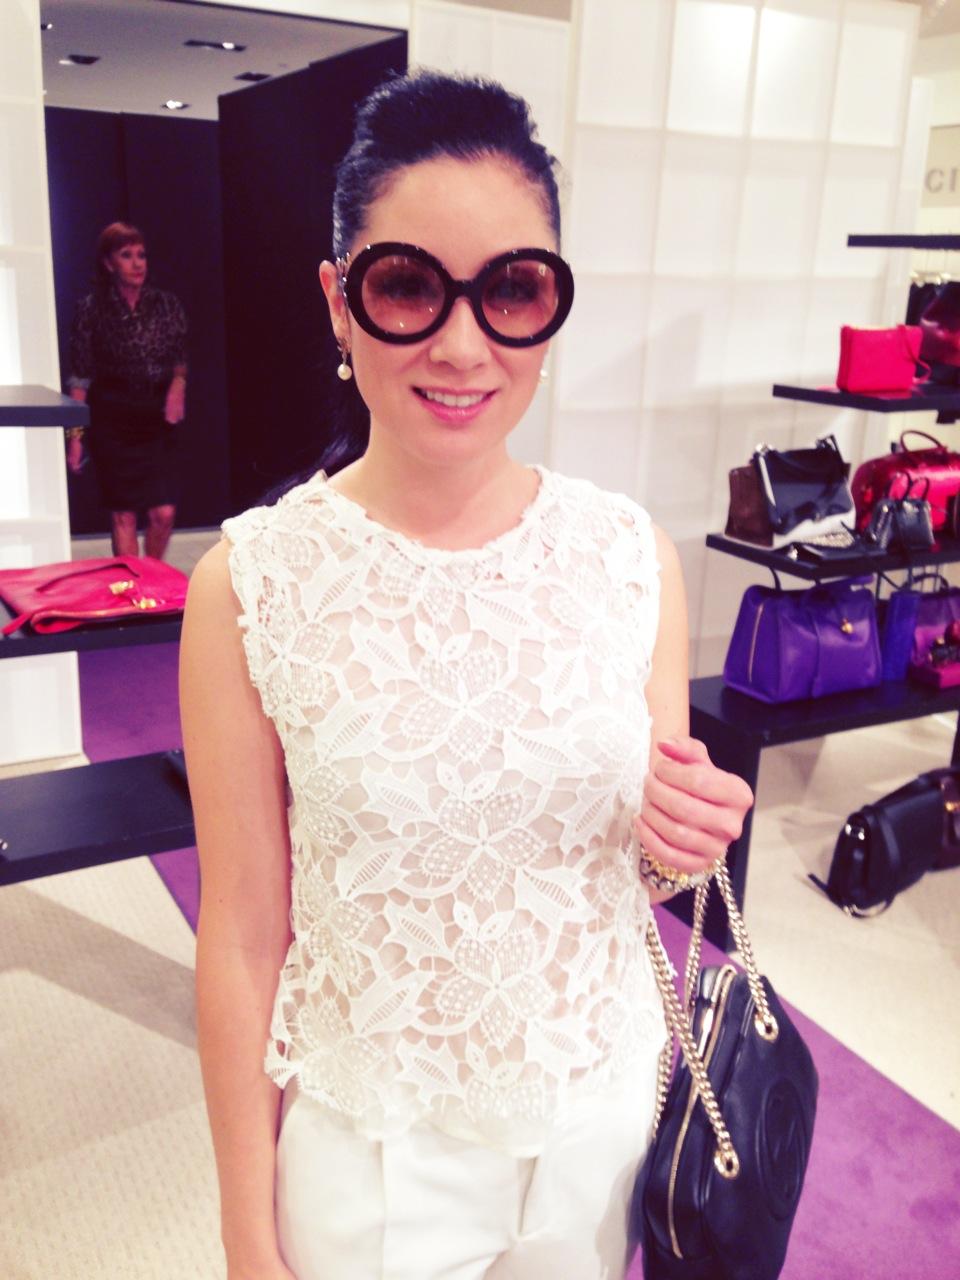 Sunglasses by Prada